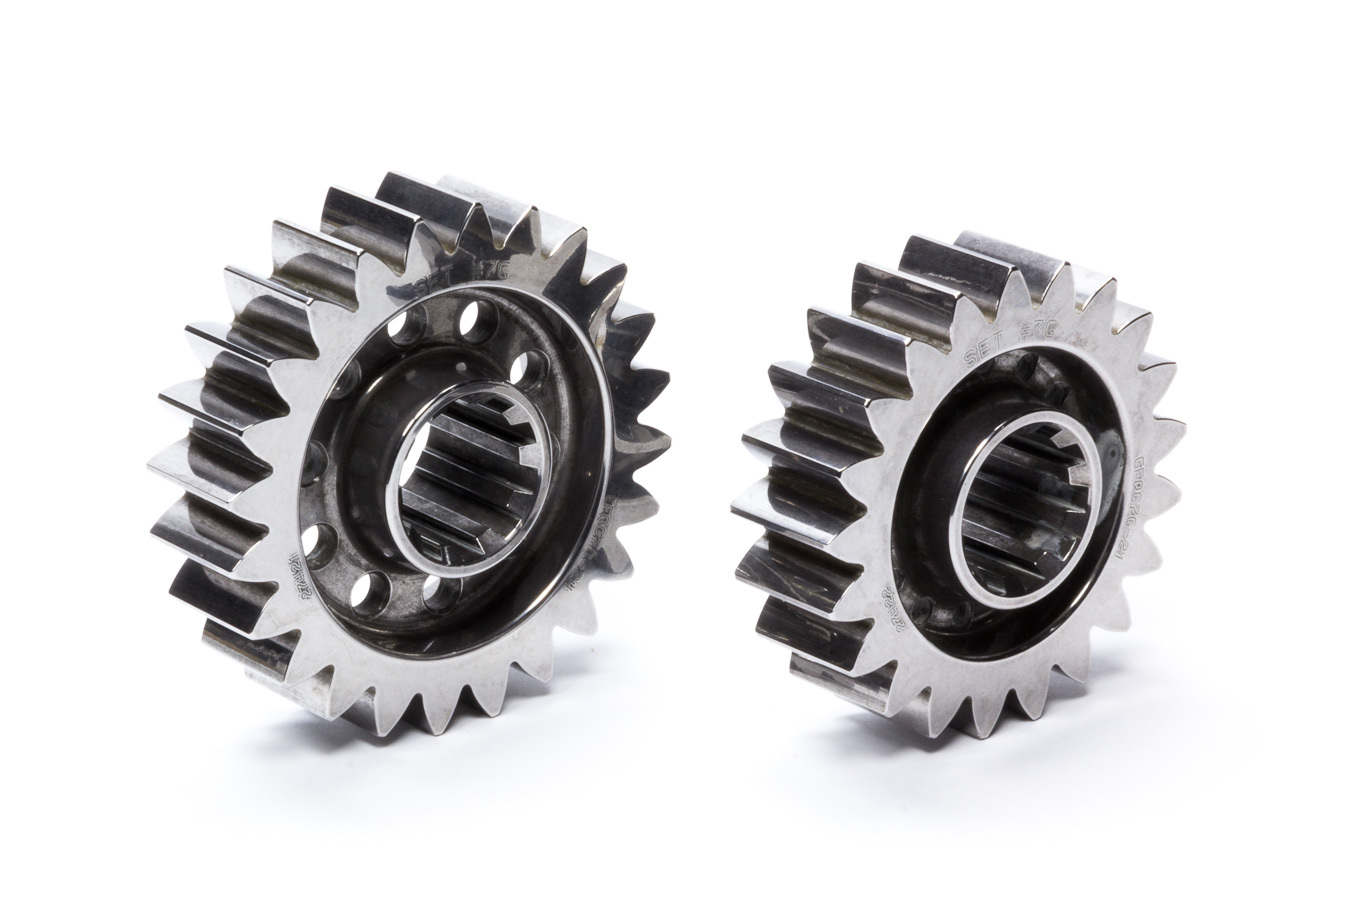 Diversified Machine FFQCG-7G Quick Change Gear Set, Friction Fighter, Set 7G, 10 Spline, 4.12 Ratios 4.71 / 3.61, 4.86 Ratios 5.55 / 4.25, Steel, Each